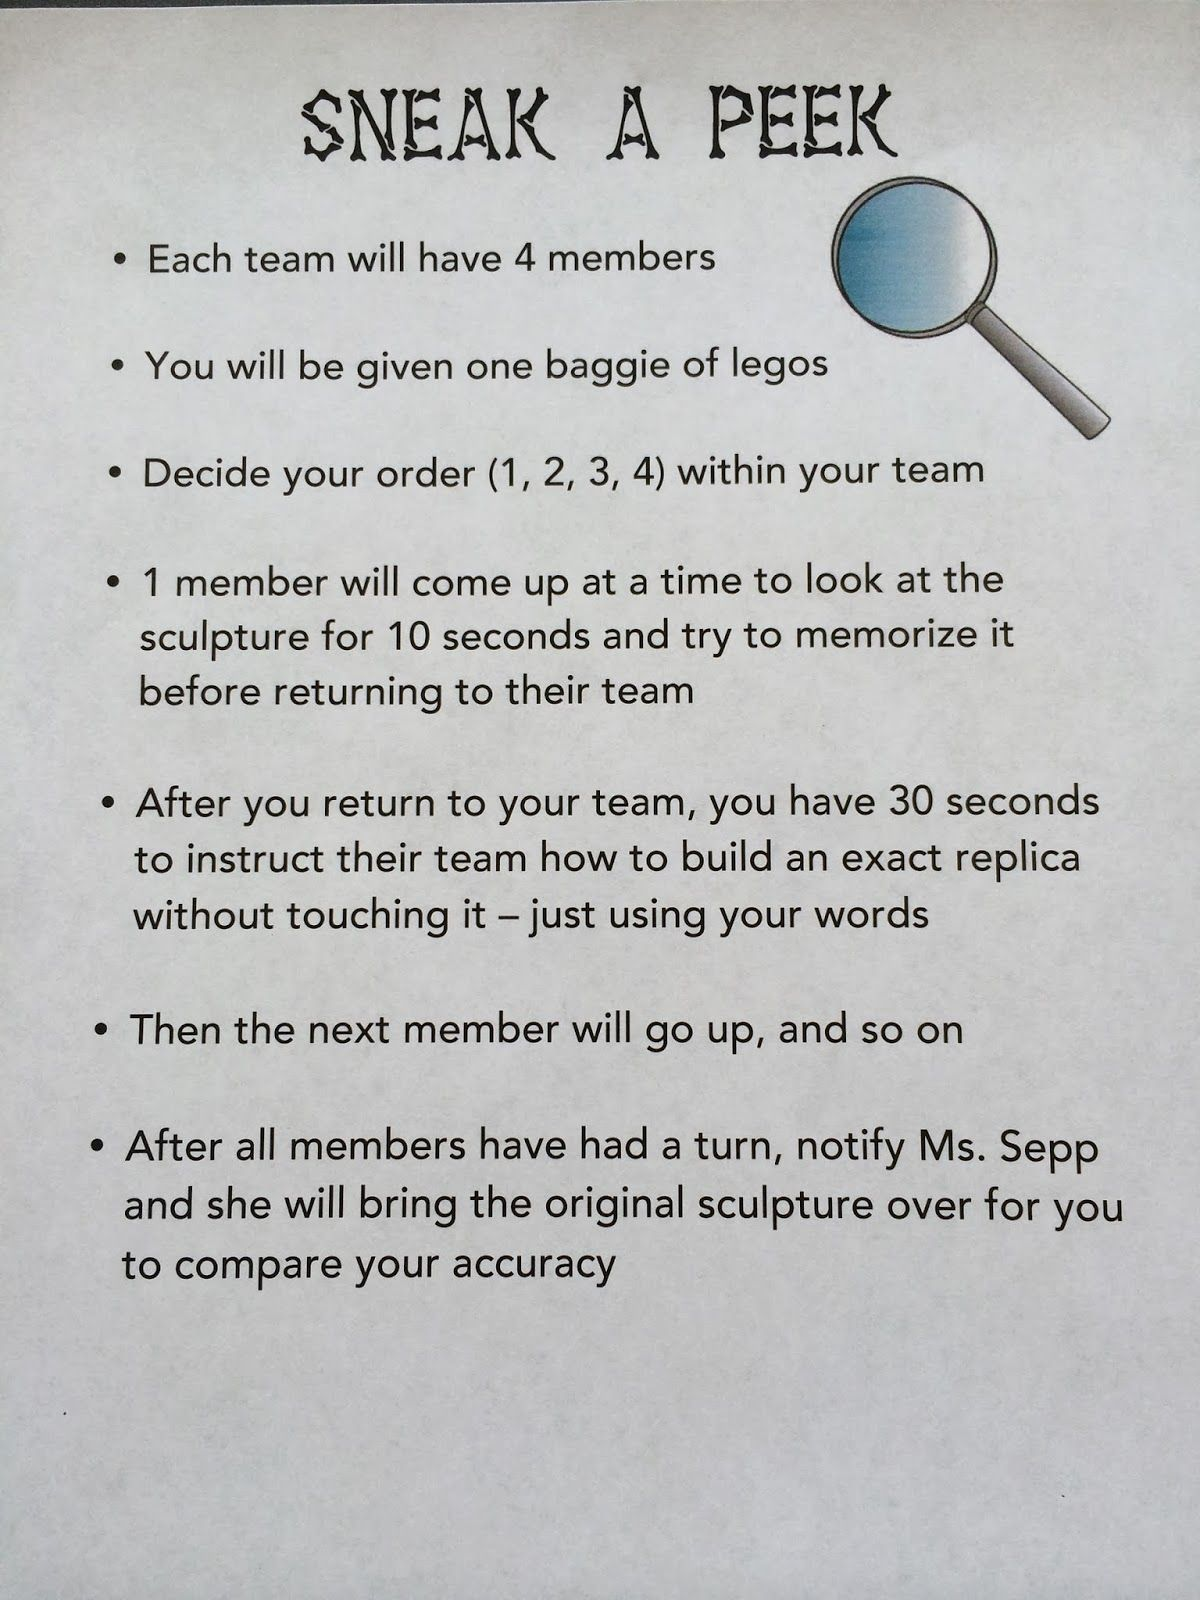 Team Building Sneak A Peek Team Building Activities For